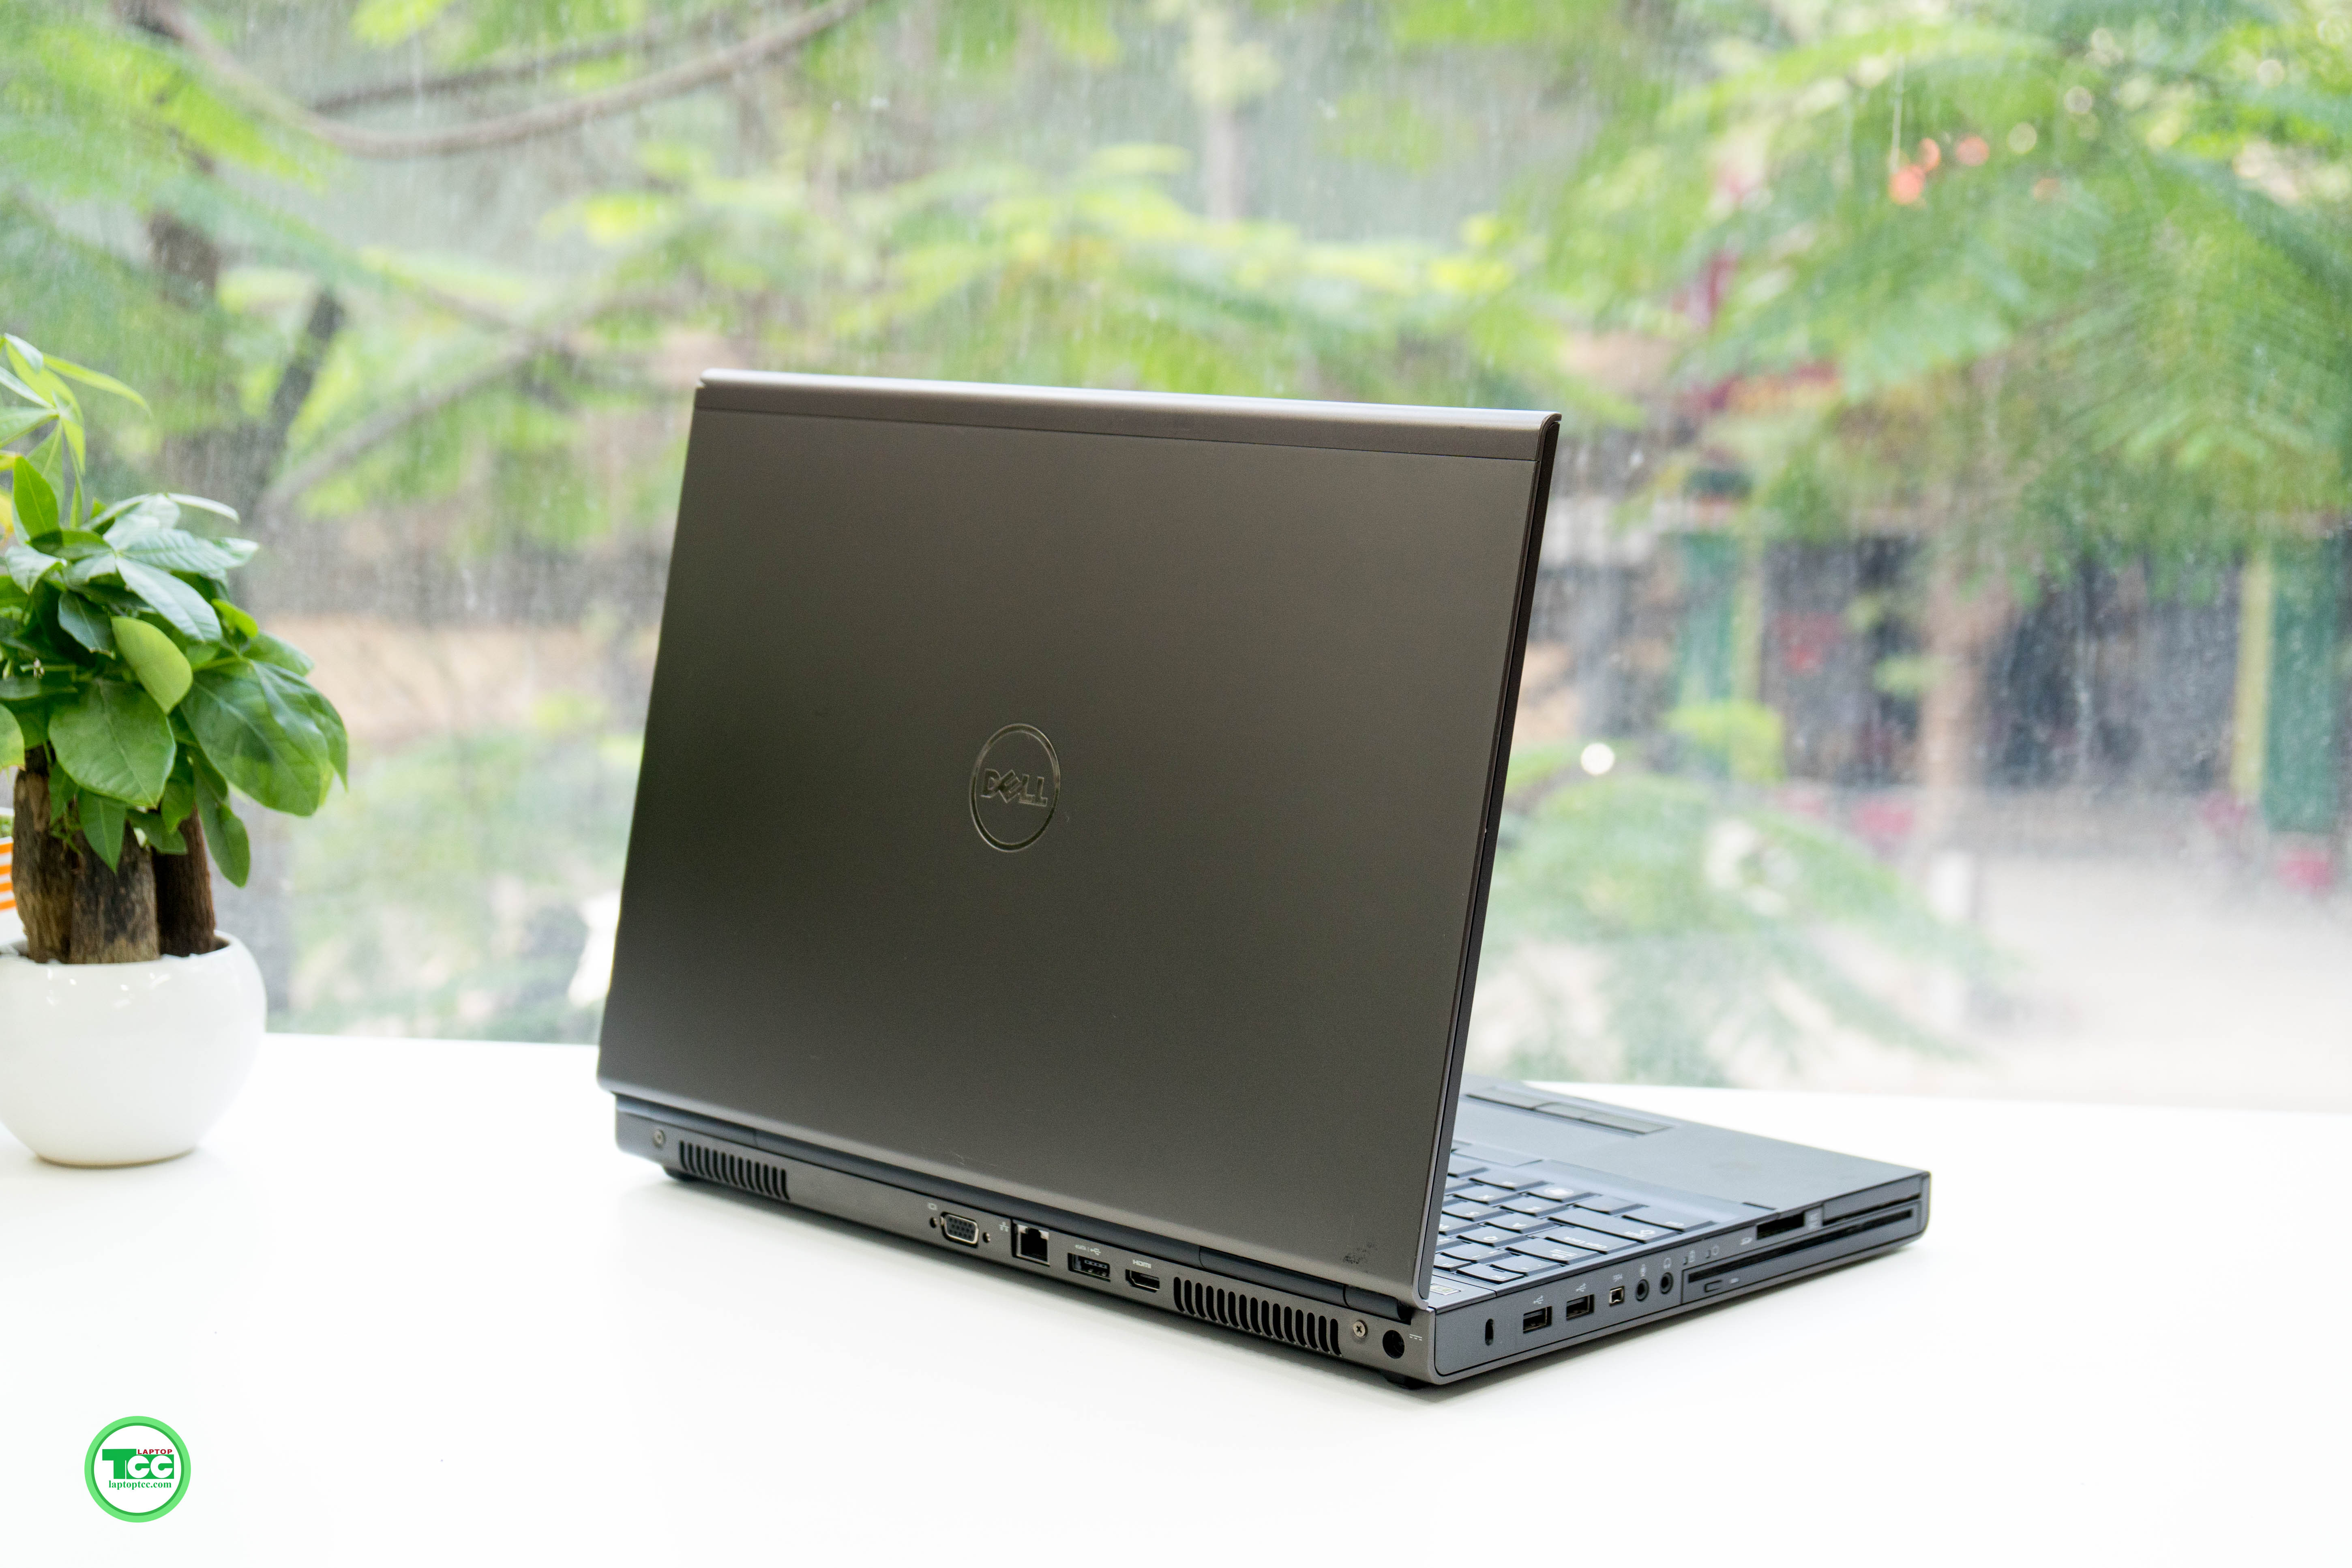 Laptop Tcc Dell Precision m4600 (2)